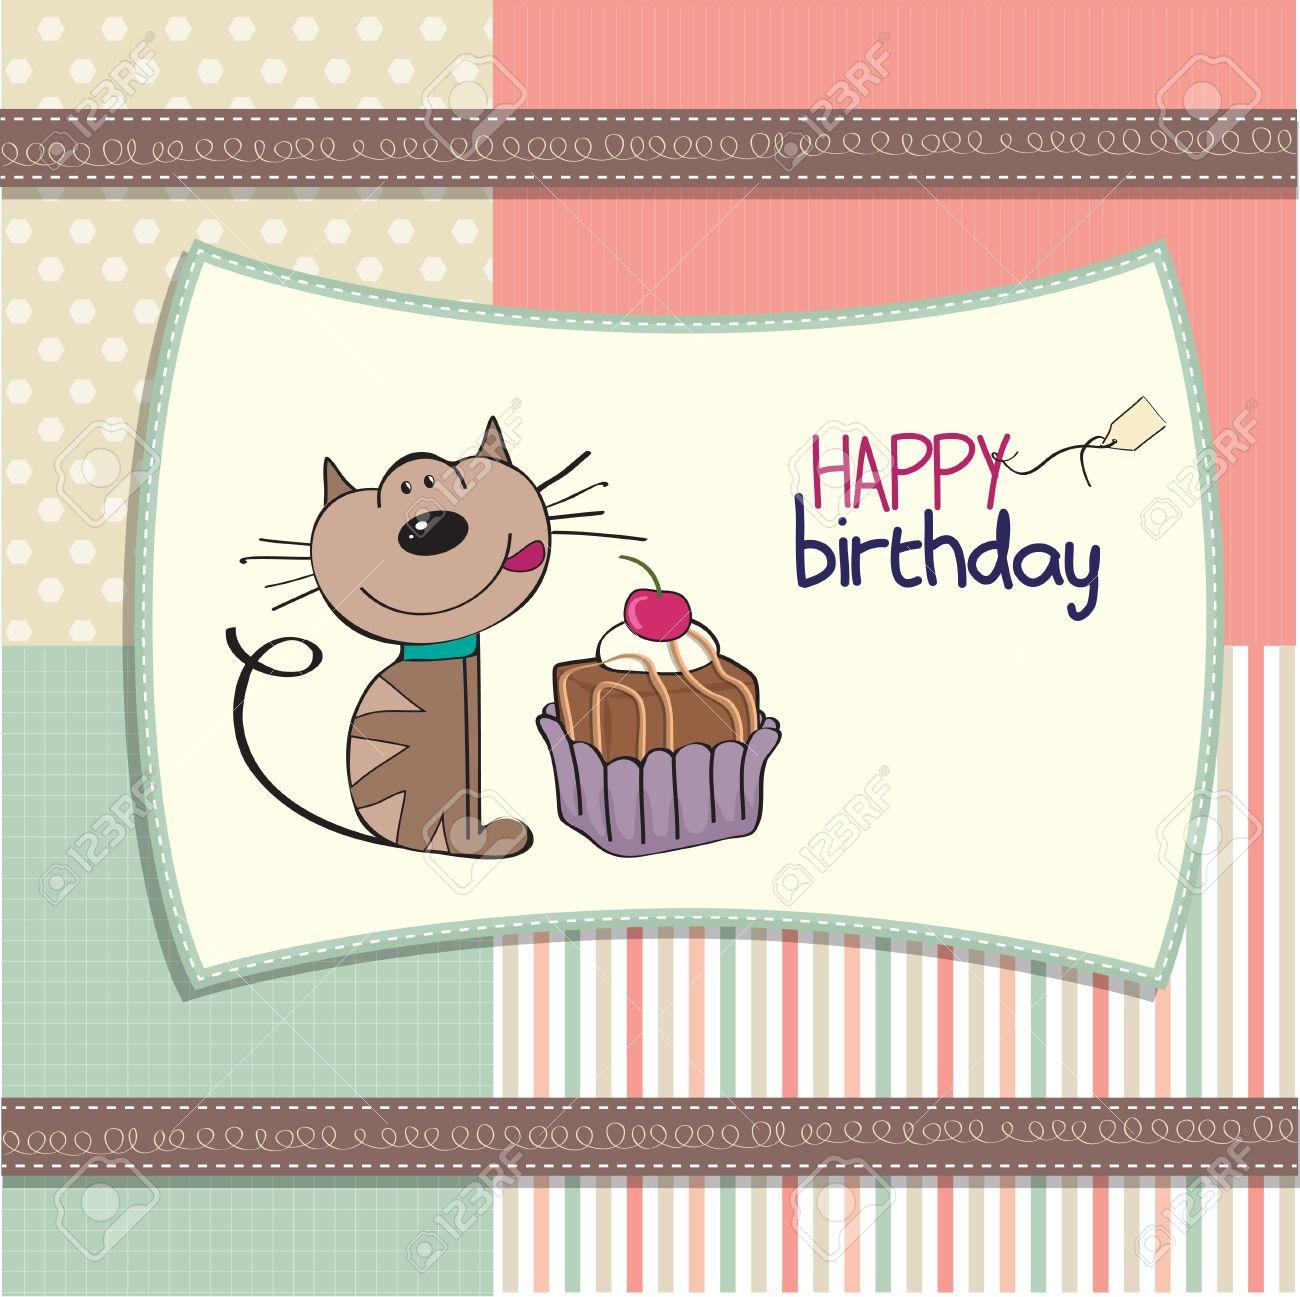 foto de archivo tarjeta de felicitacin de cumpleaos con un gato esperando para comer un pastel with comida cumpleaos